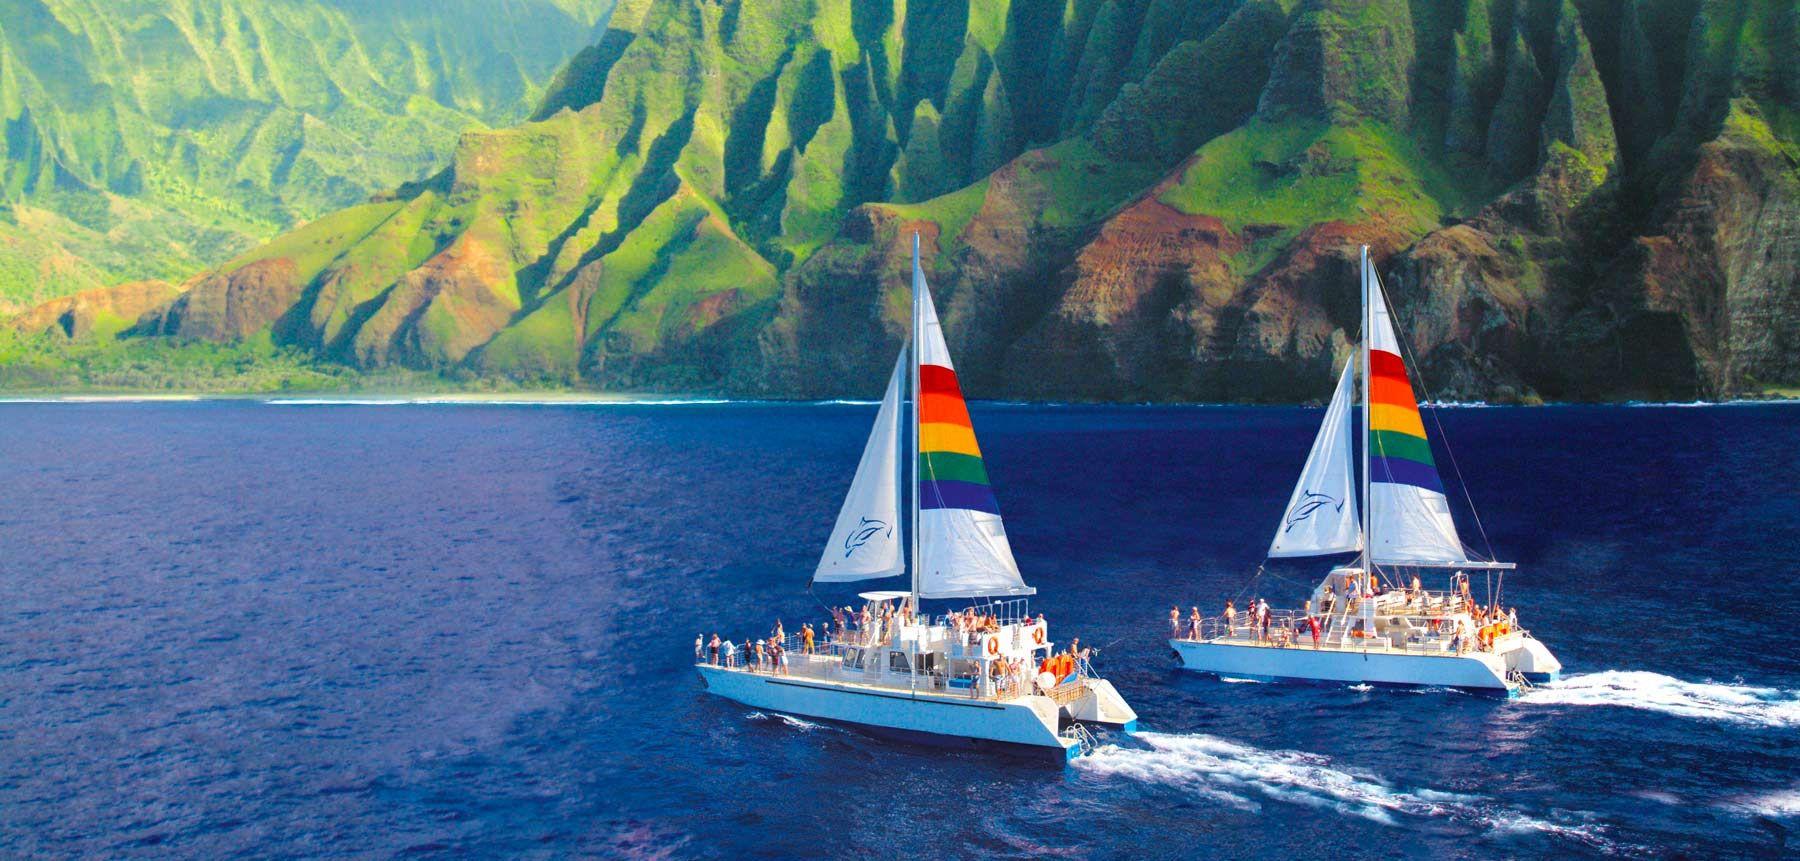 we specialize in kauai boat tours along the na pali coast, niihau